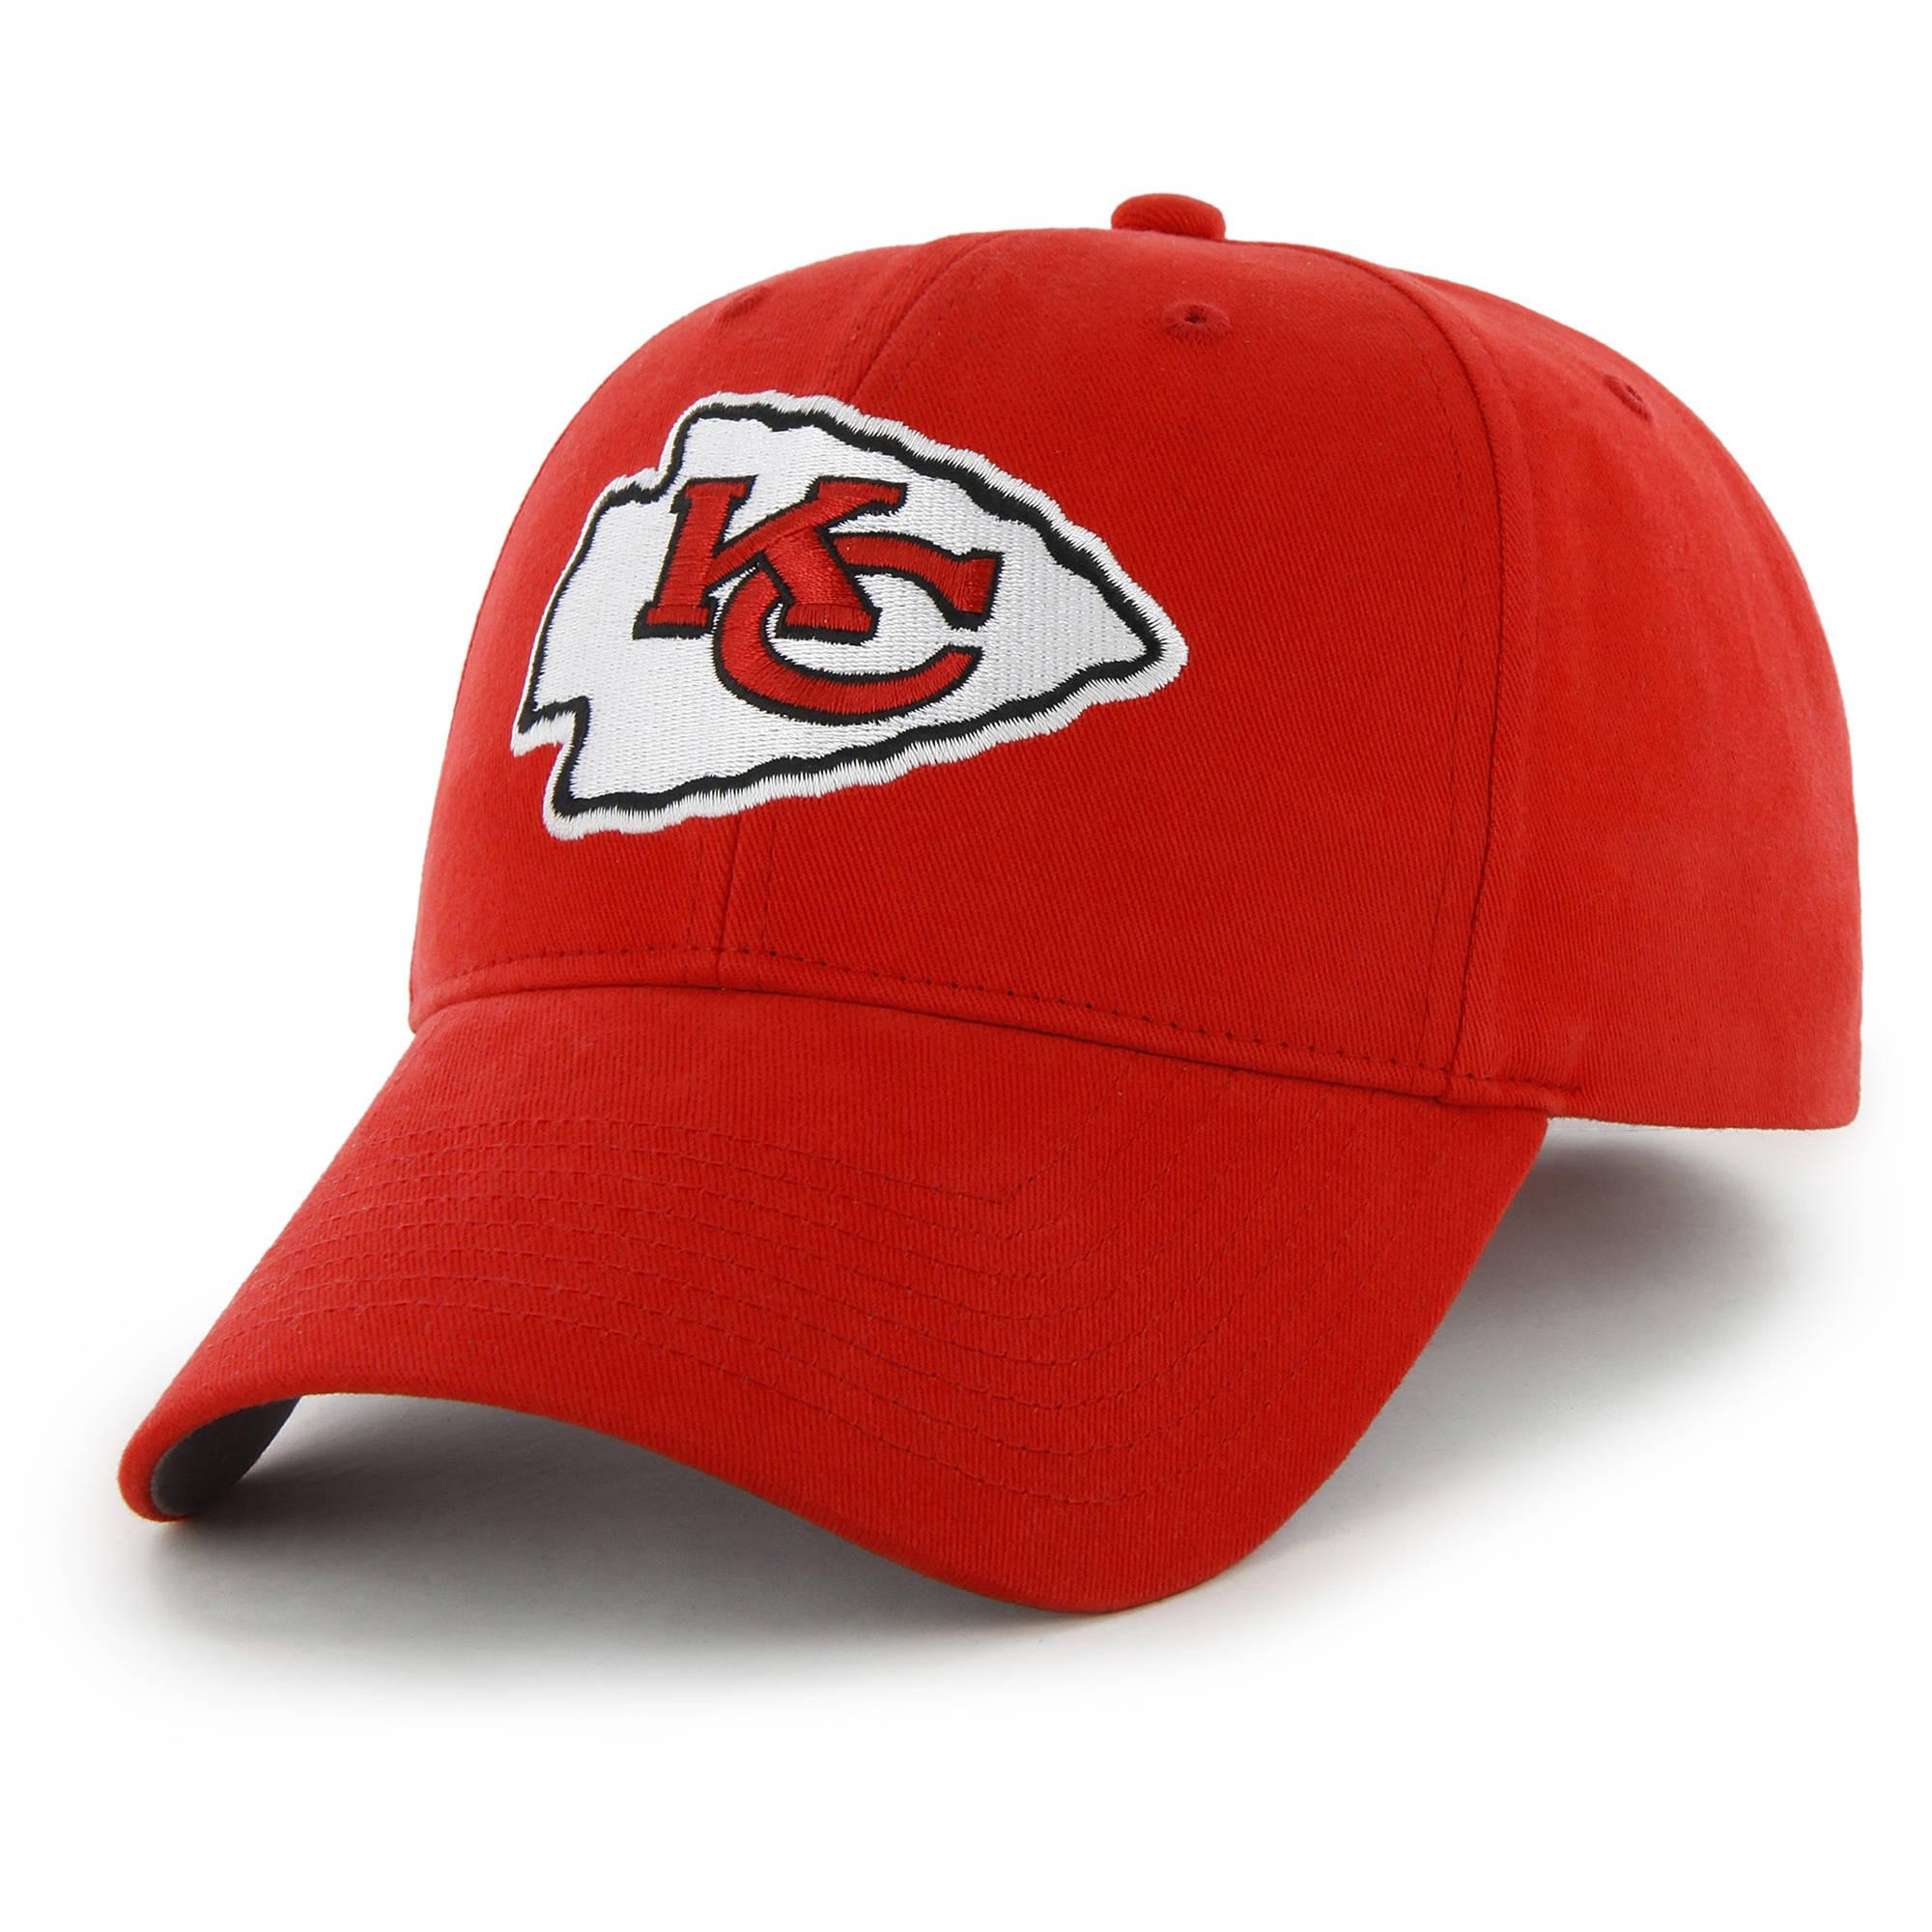 NFL Fan FavoriteBasic Cap, Kansas City Chiefs